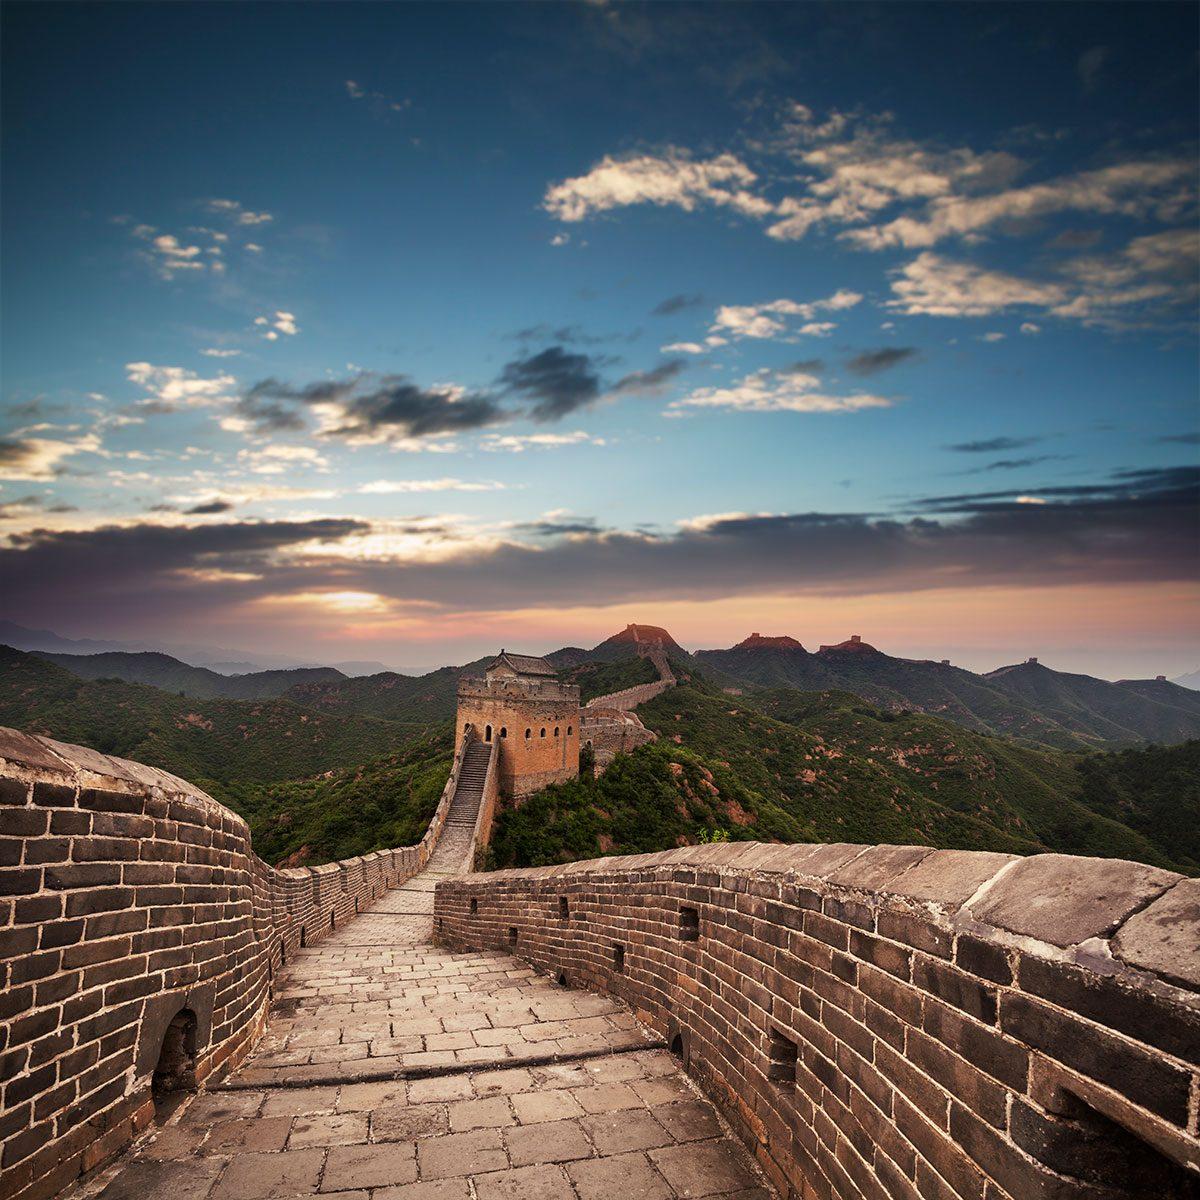 Kinesiska turister koar for forbjudna bocker